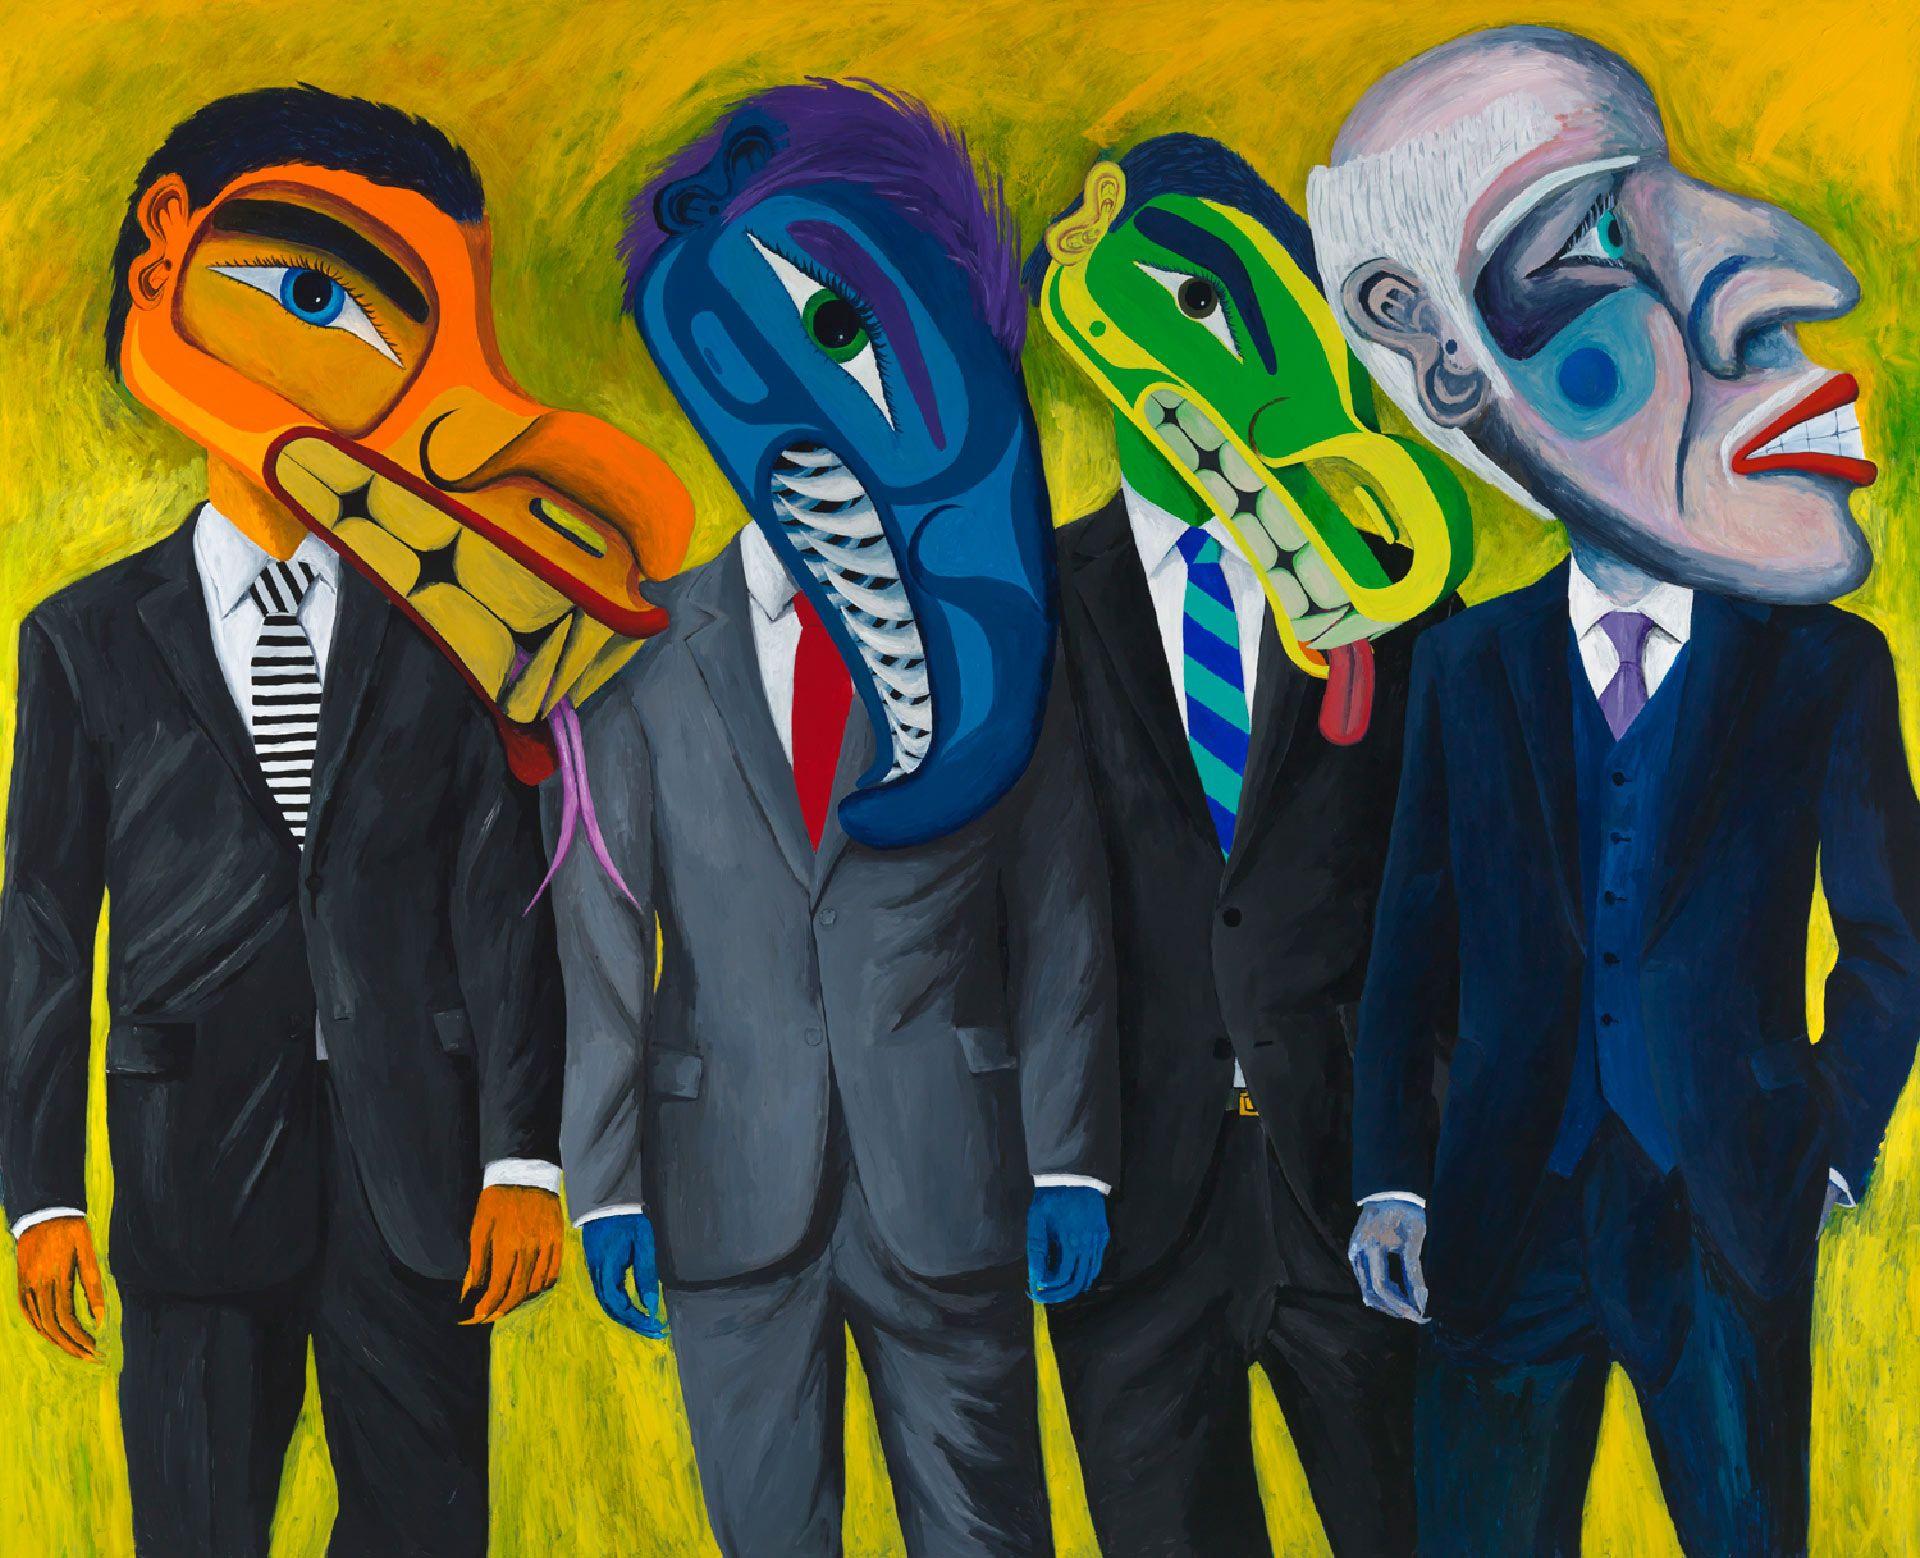 Lawrence Paul Yuxweluptun (born in 1957), Super Predators: The One Percent, 2015, acrylic on canvas. Photo Joseph Hartman.